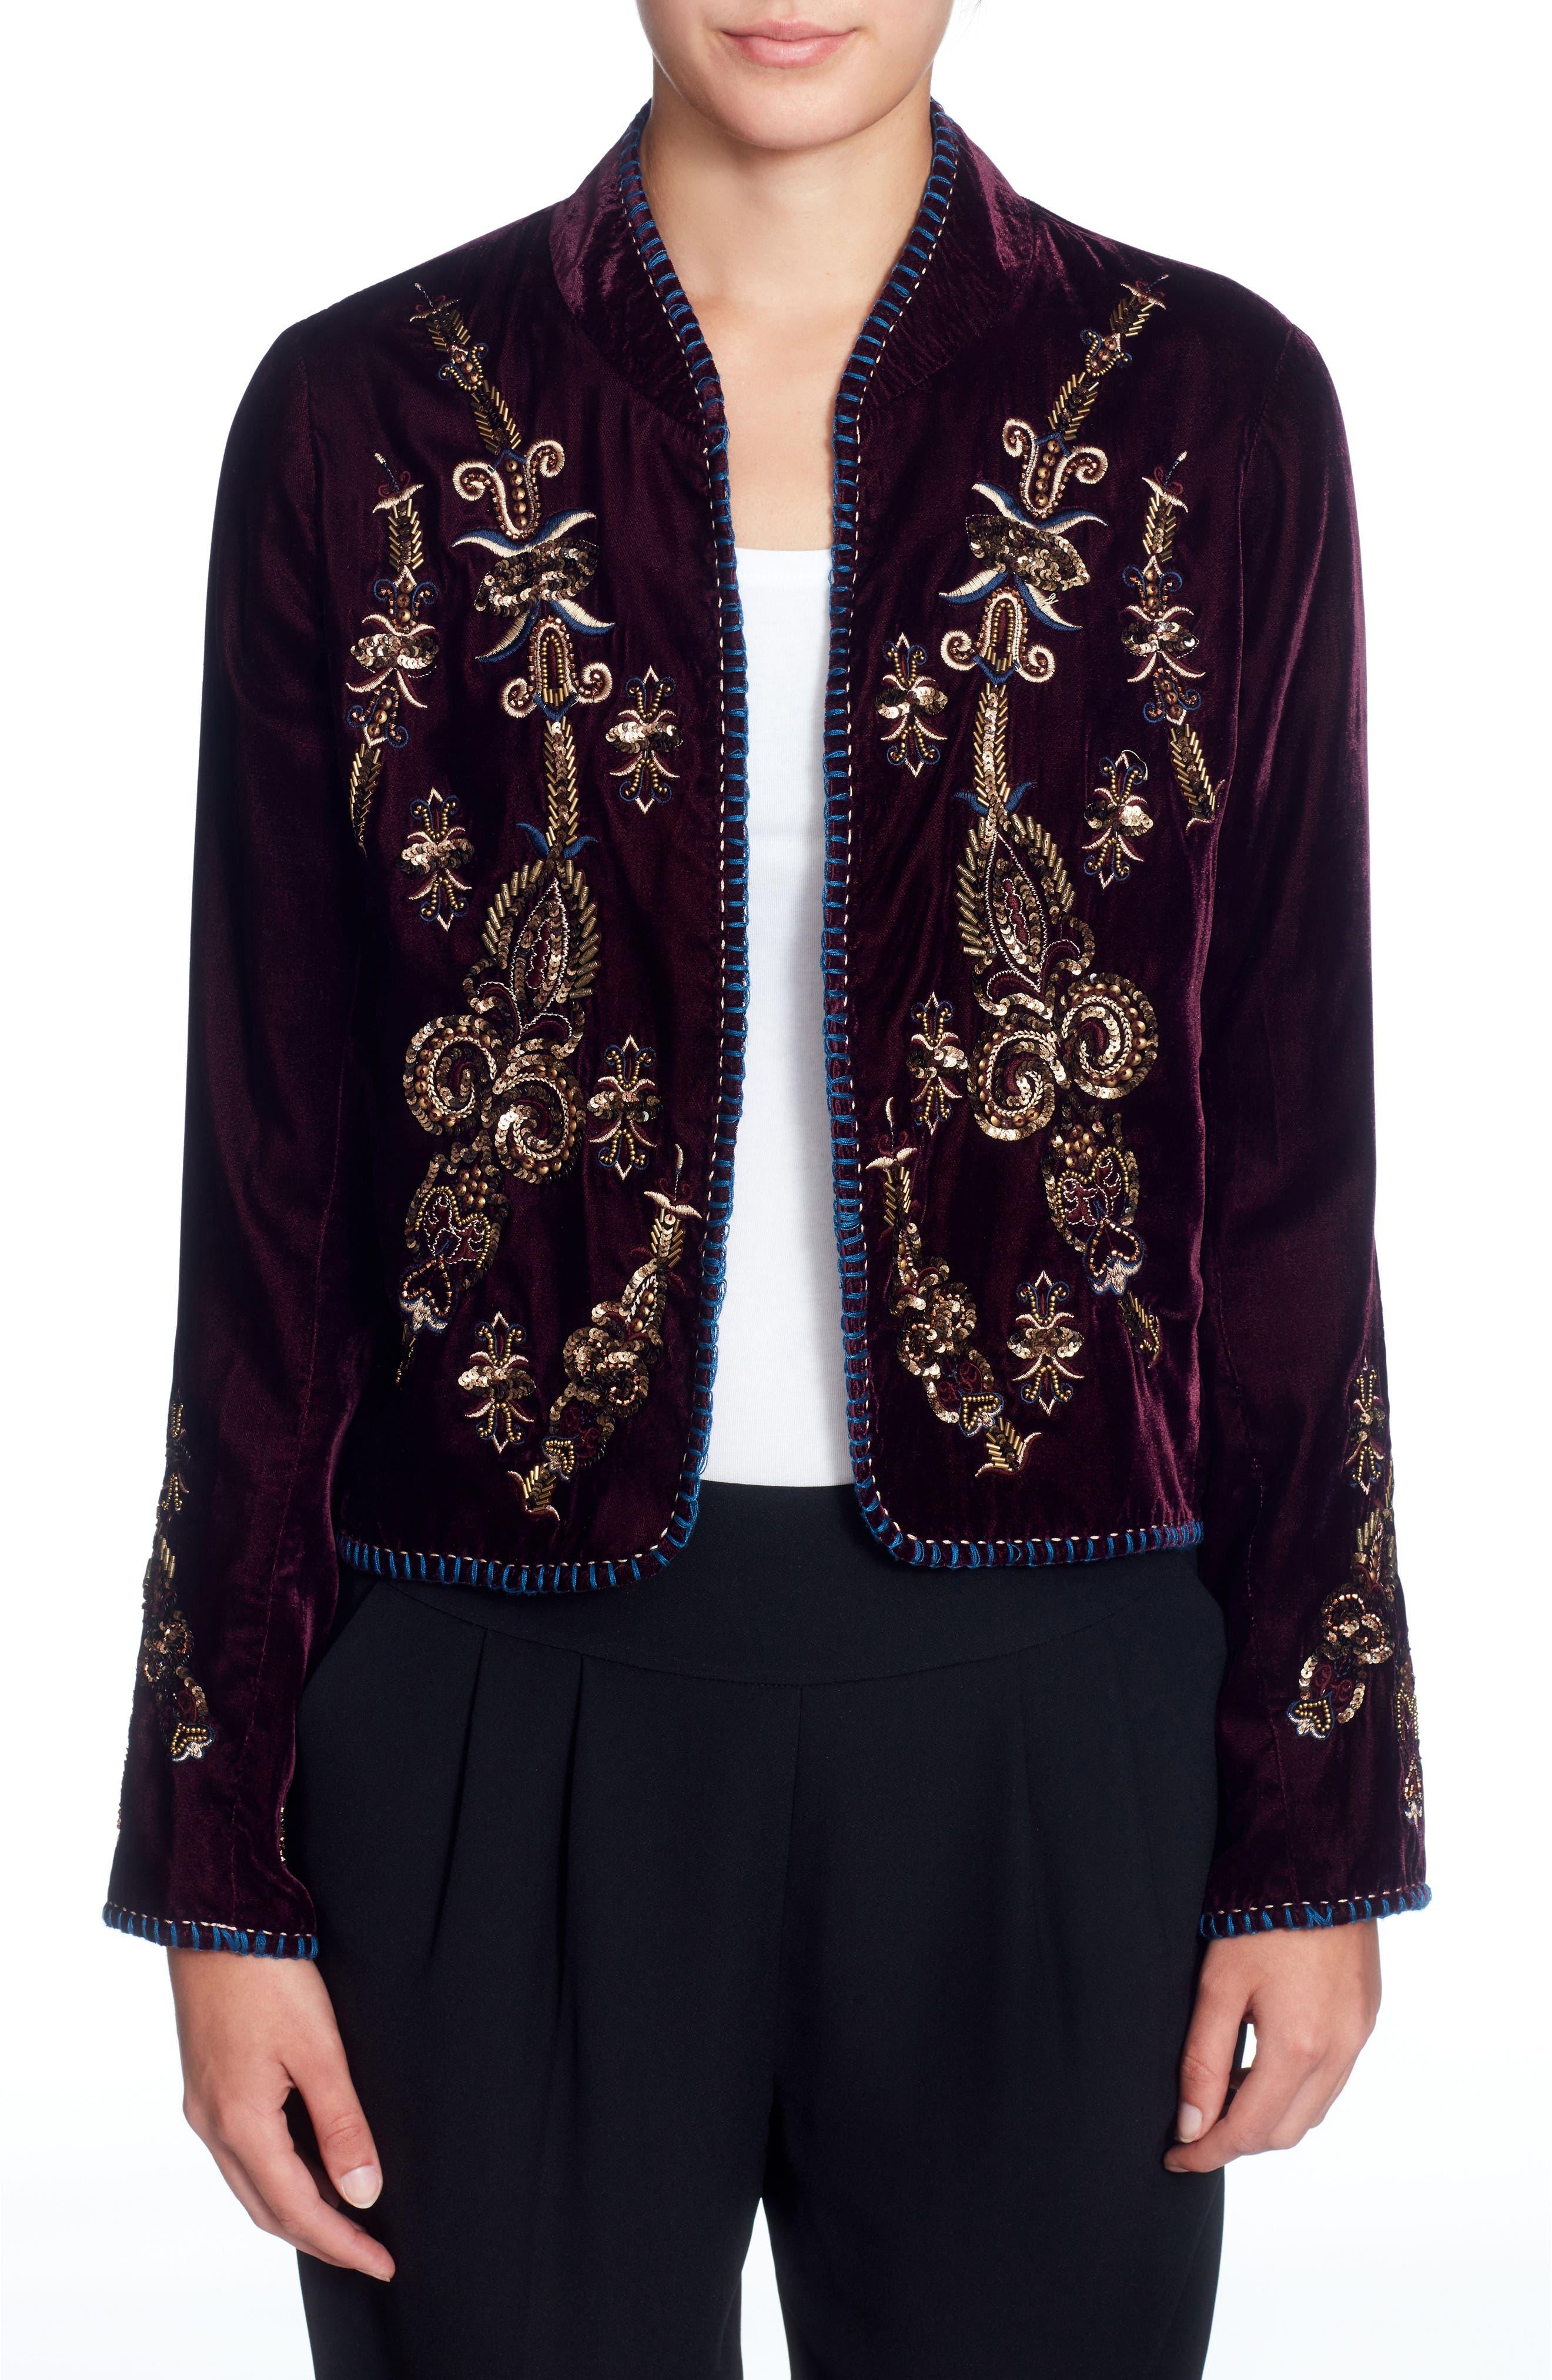 Winstead Embellished Velvet Jacket,                             Main thumbnail 1, color,                             Grape Wine